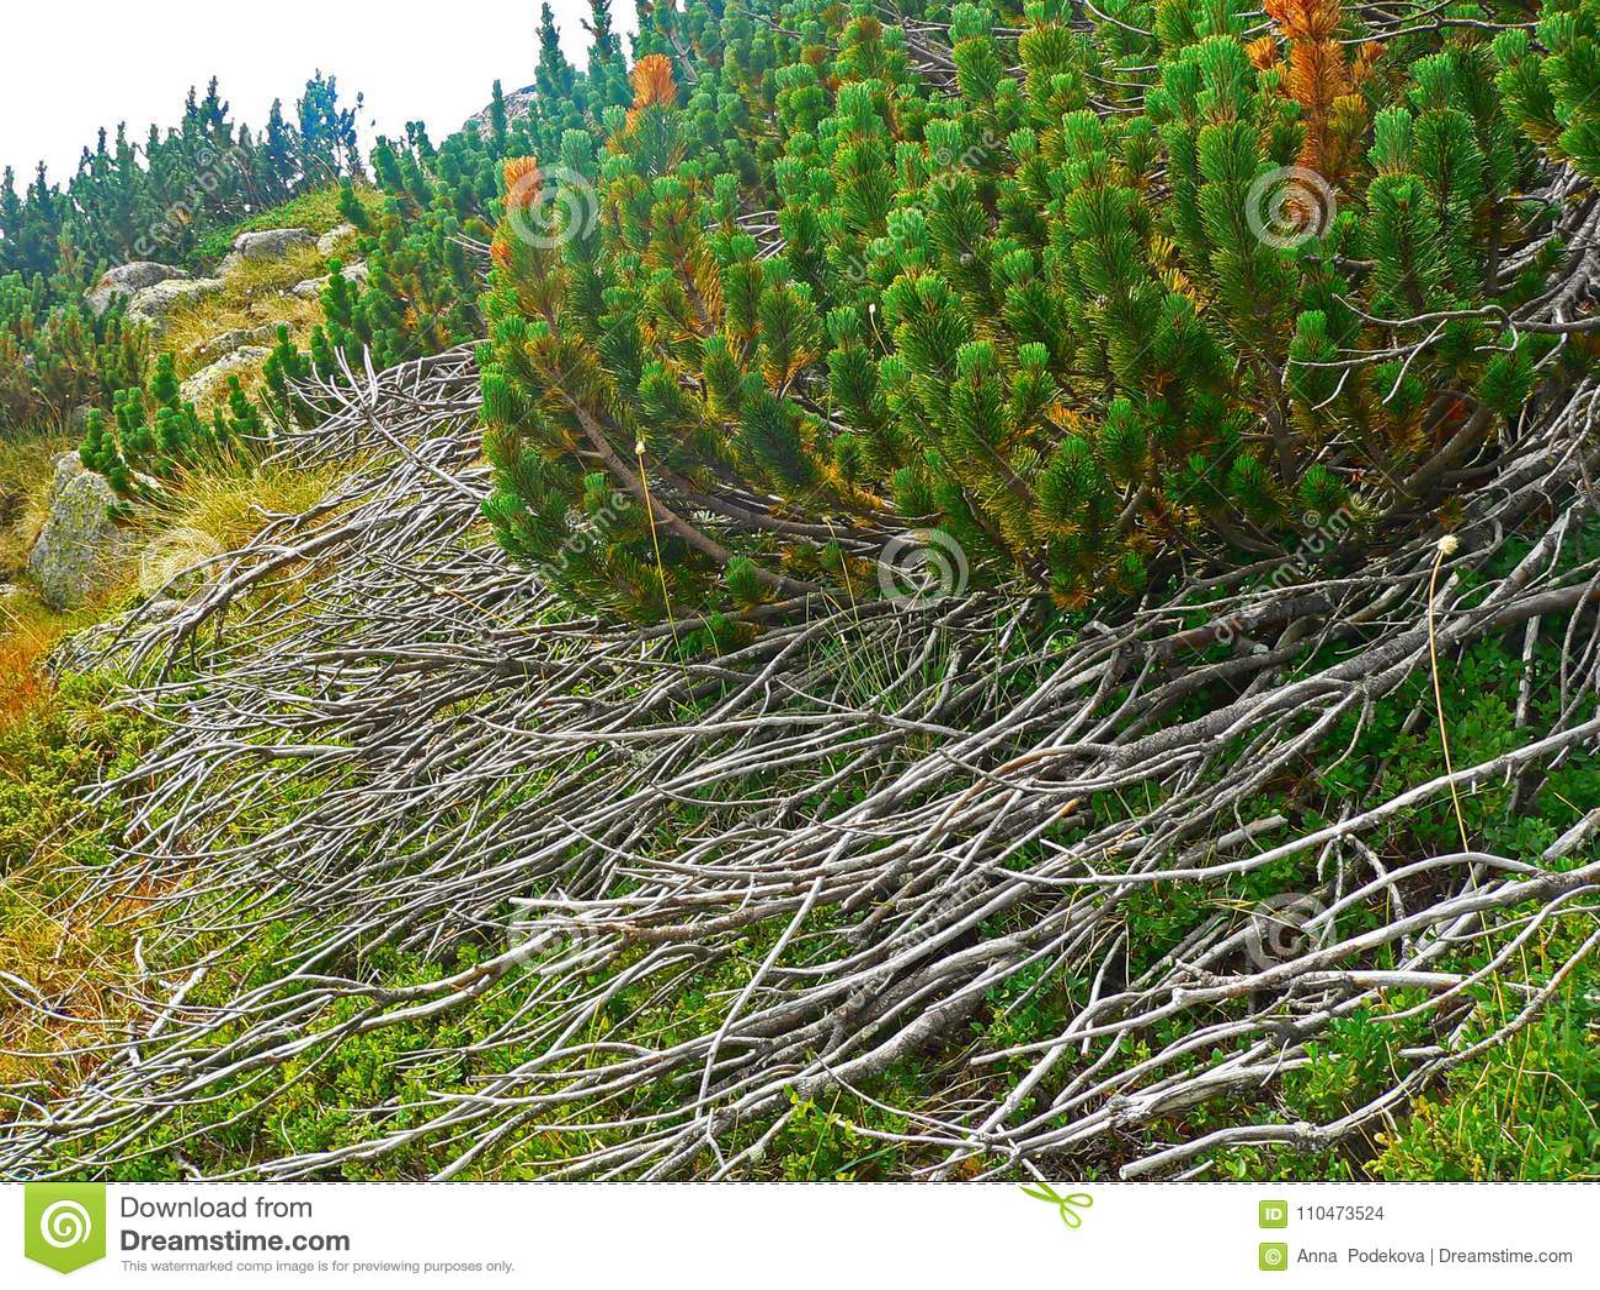 Alpine mountain vegetation close up background plant Pinus mugo textures and grass.